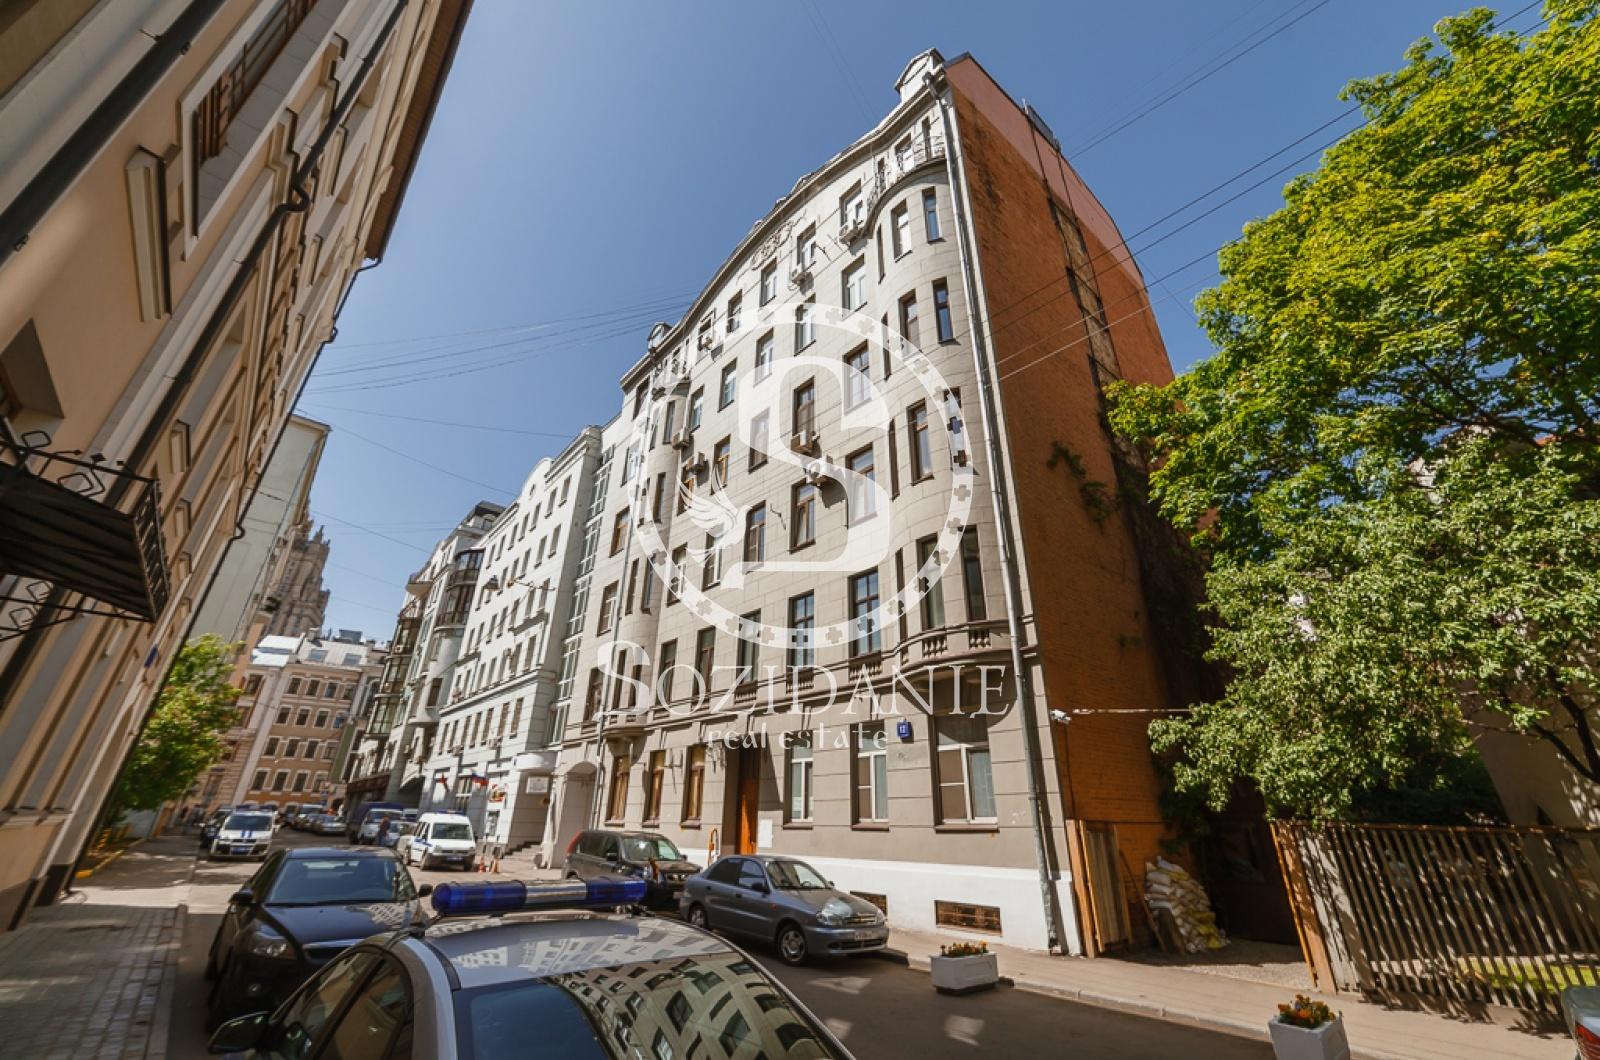 5 Комнаты, Городская, Аренда, Кривоарбатский переулок, Listing ID 1148, Москва, Россия,